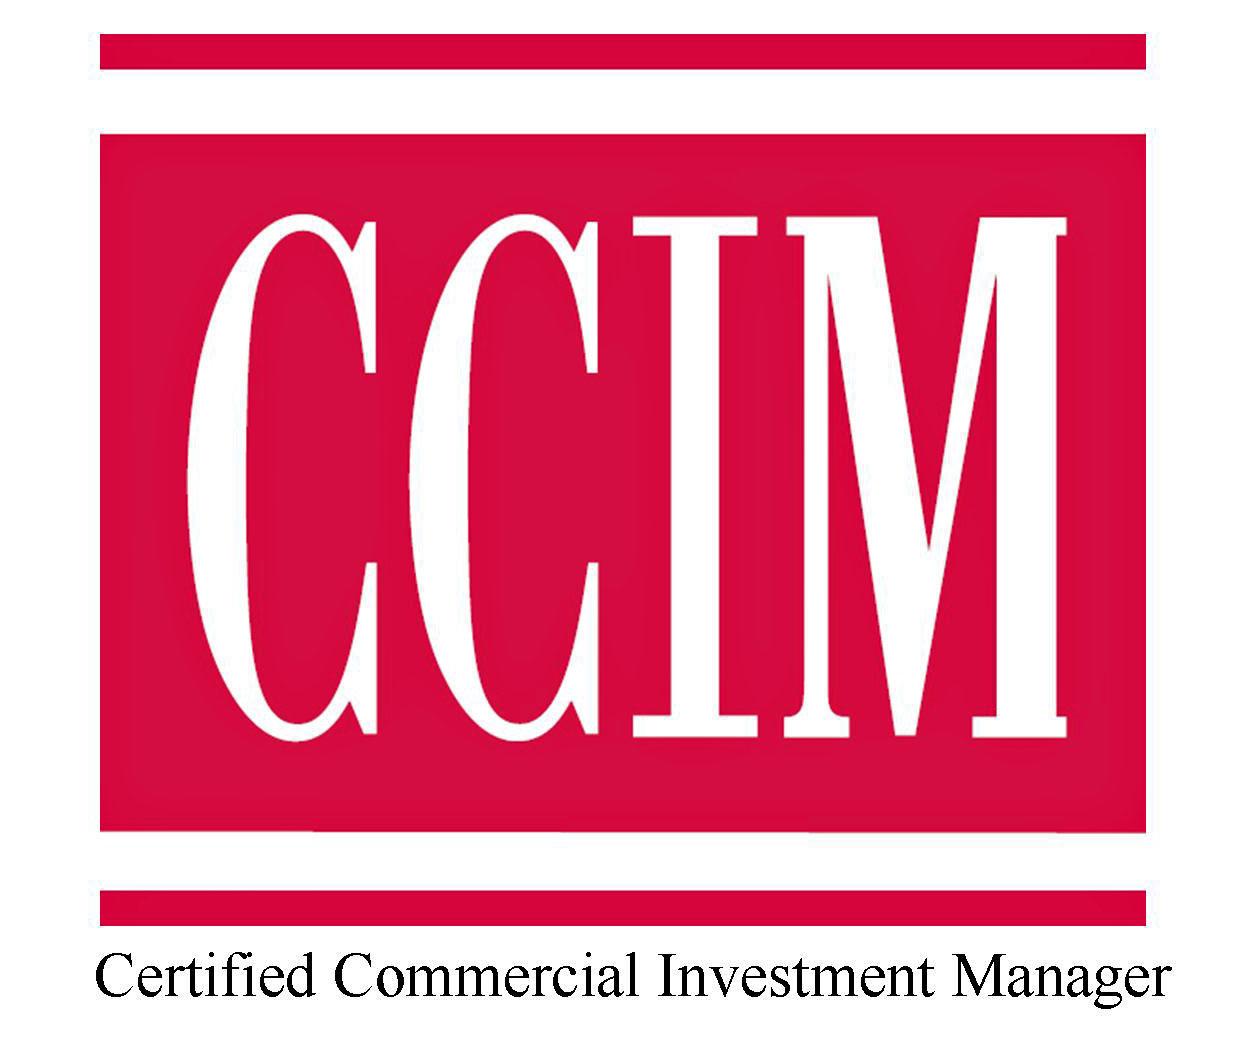 CCIM Logo RED Commercial Realtor